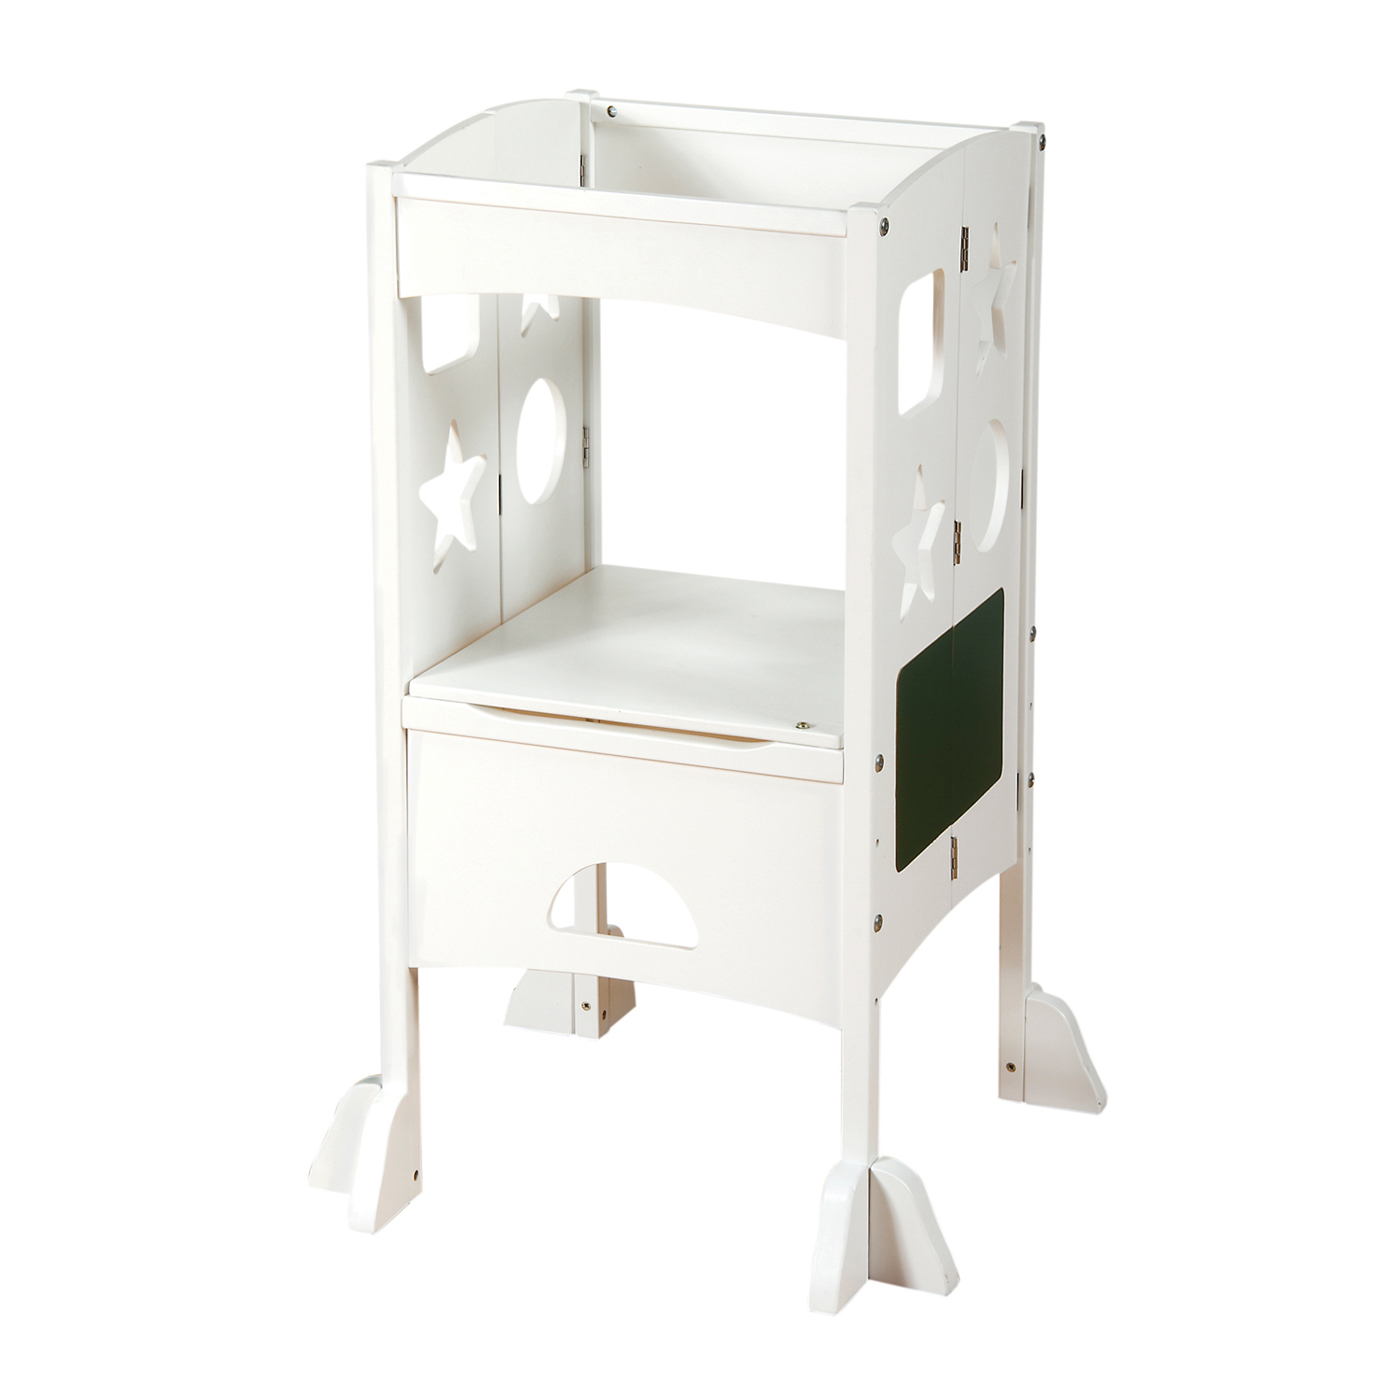 Child kitchen helper stool Photo - 7